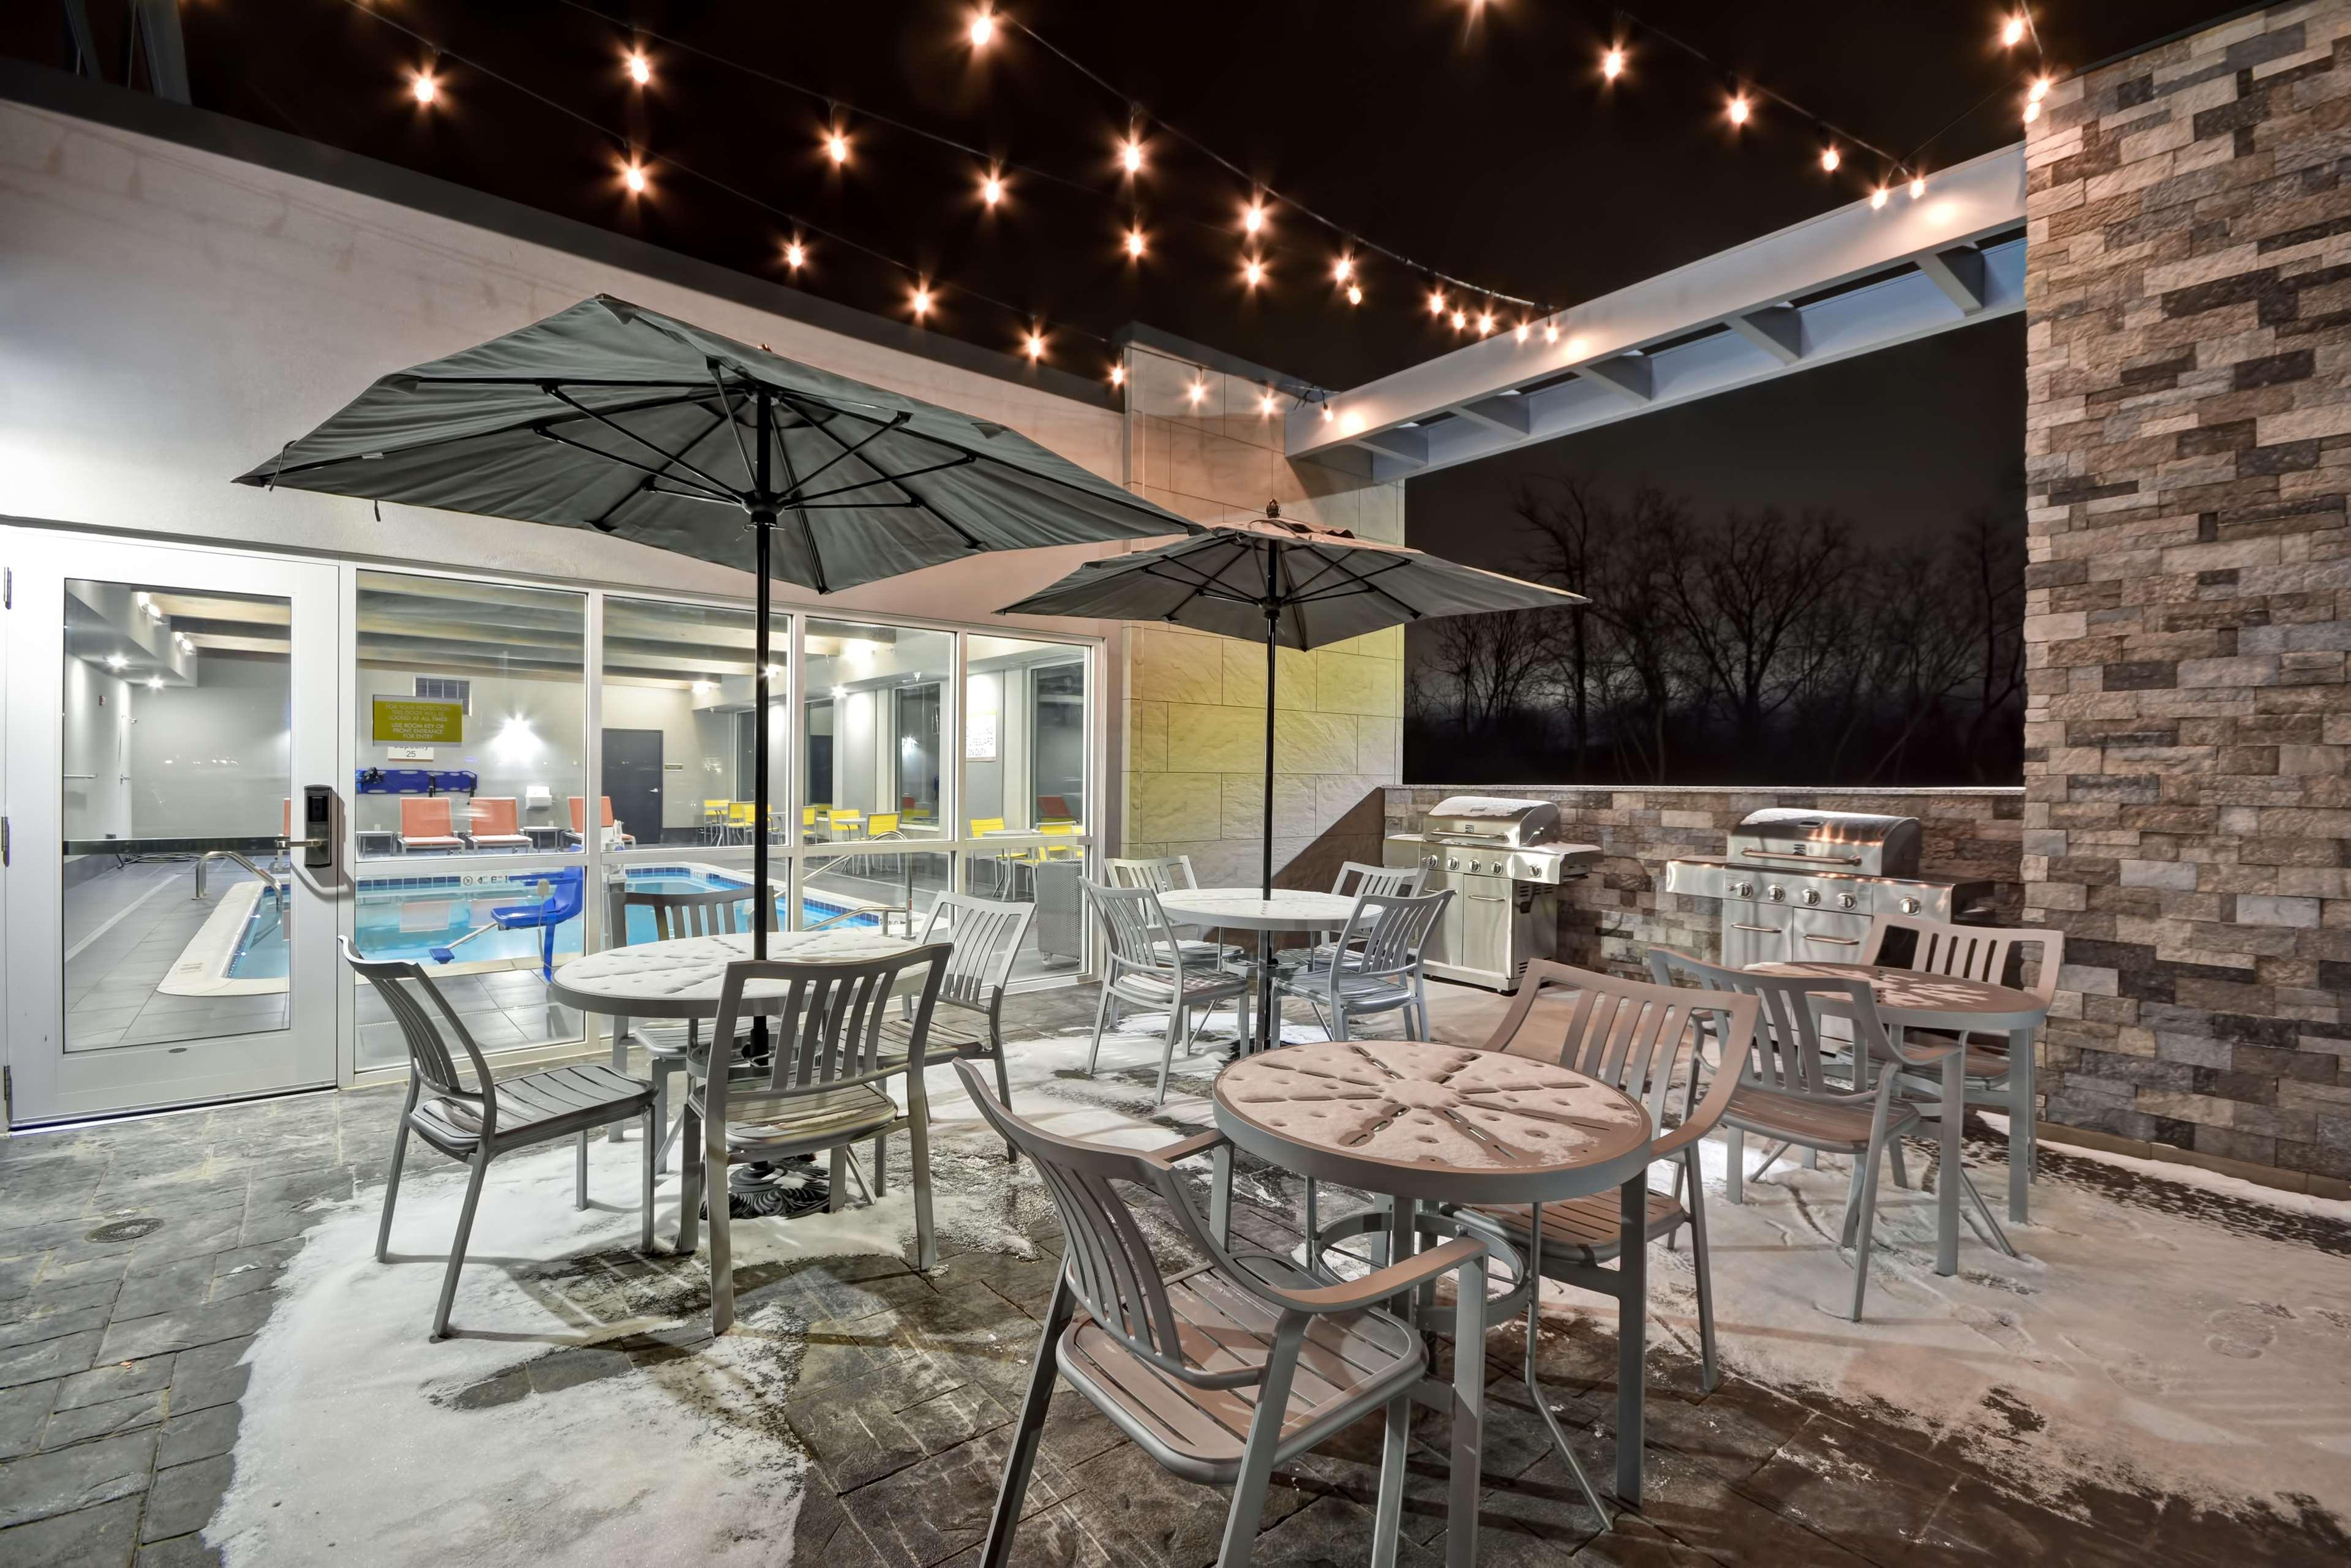 Home2 Suites by Hilton Jackson image 2